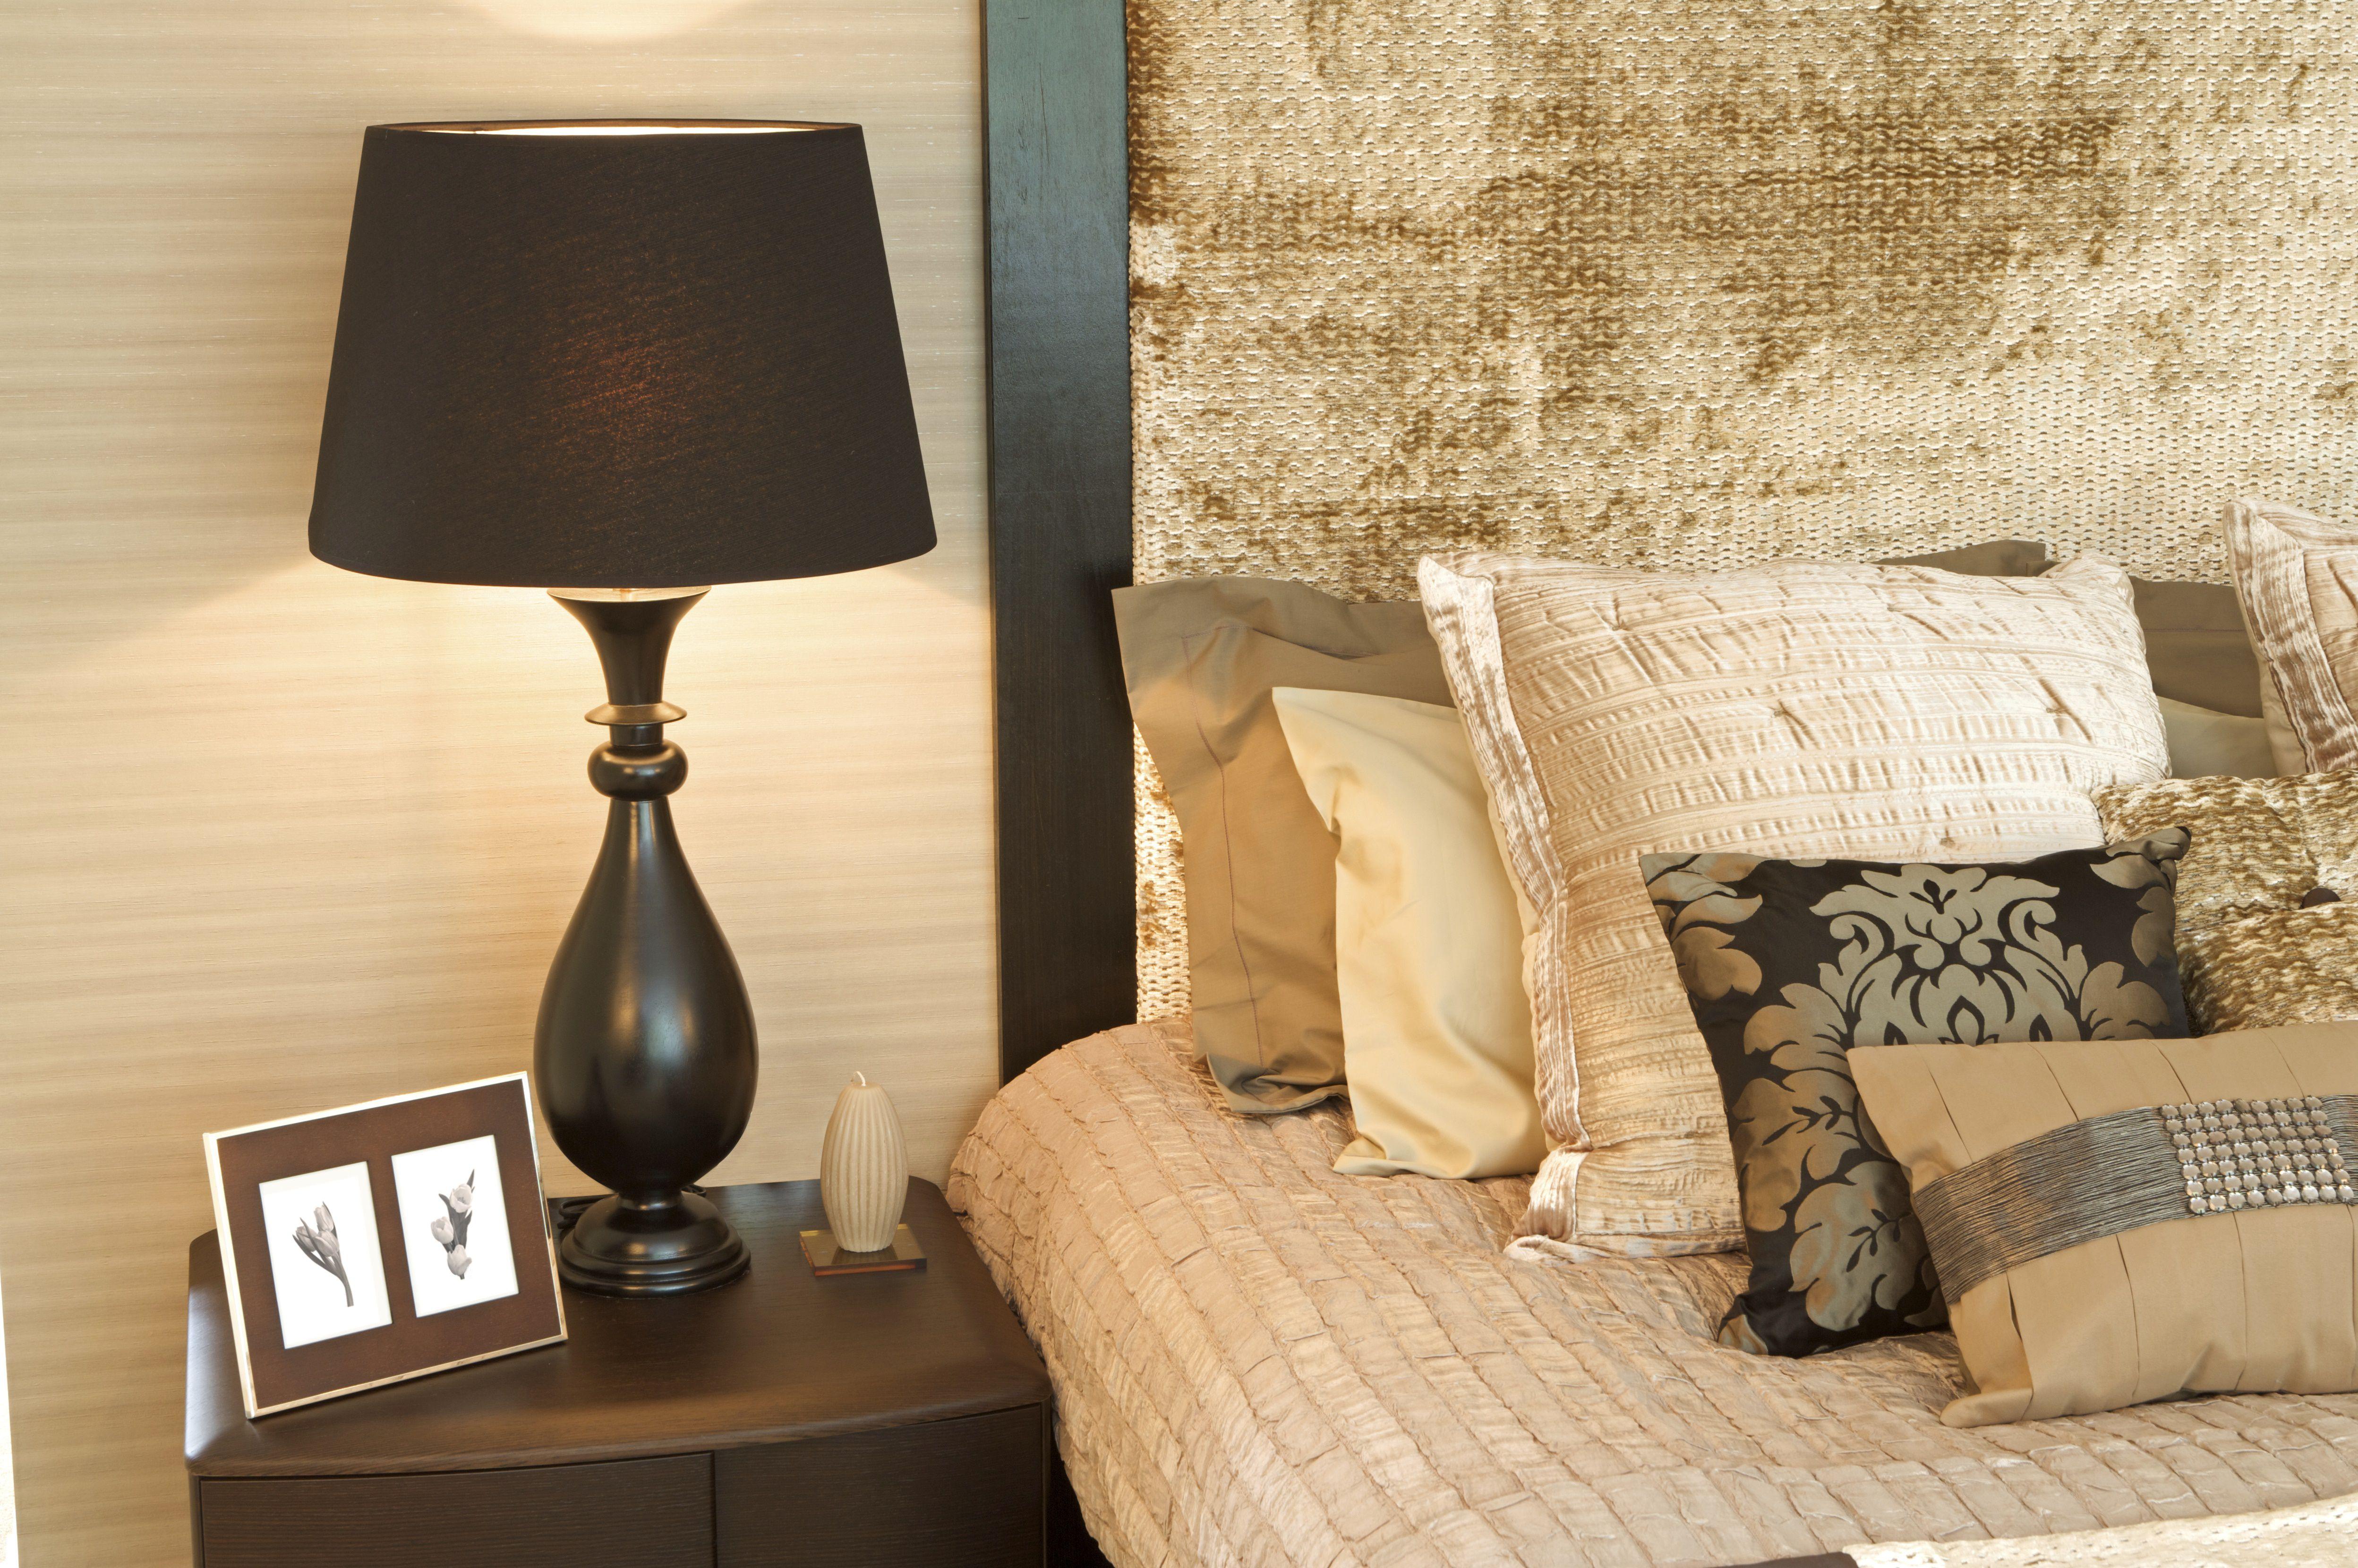 bedside lamp in bedroom